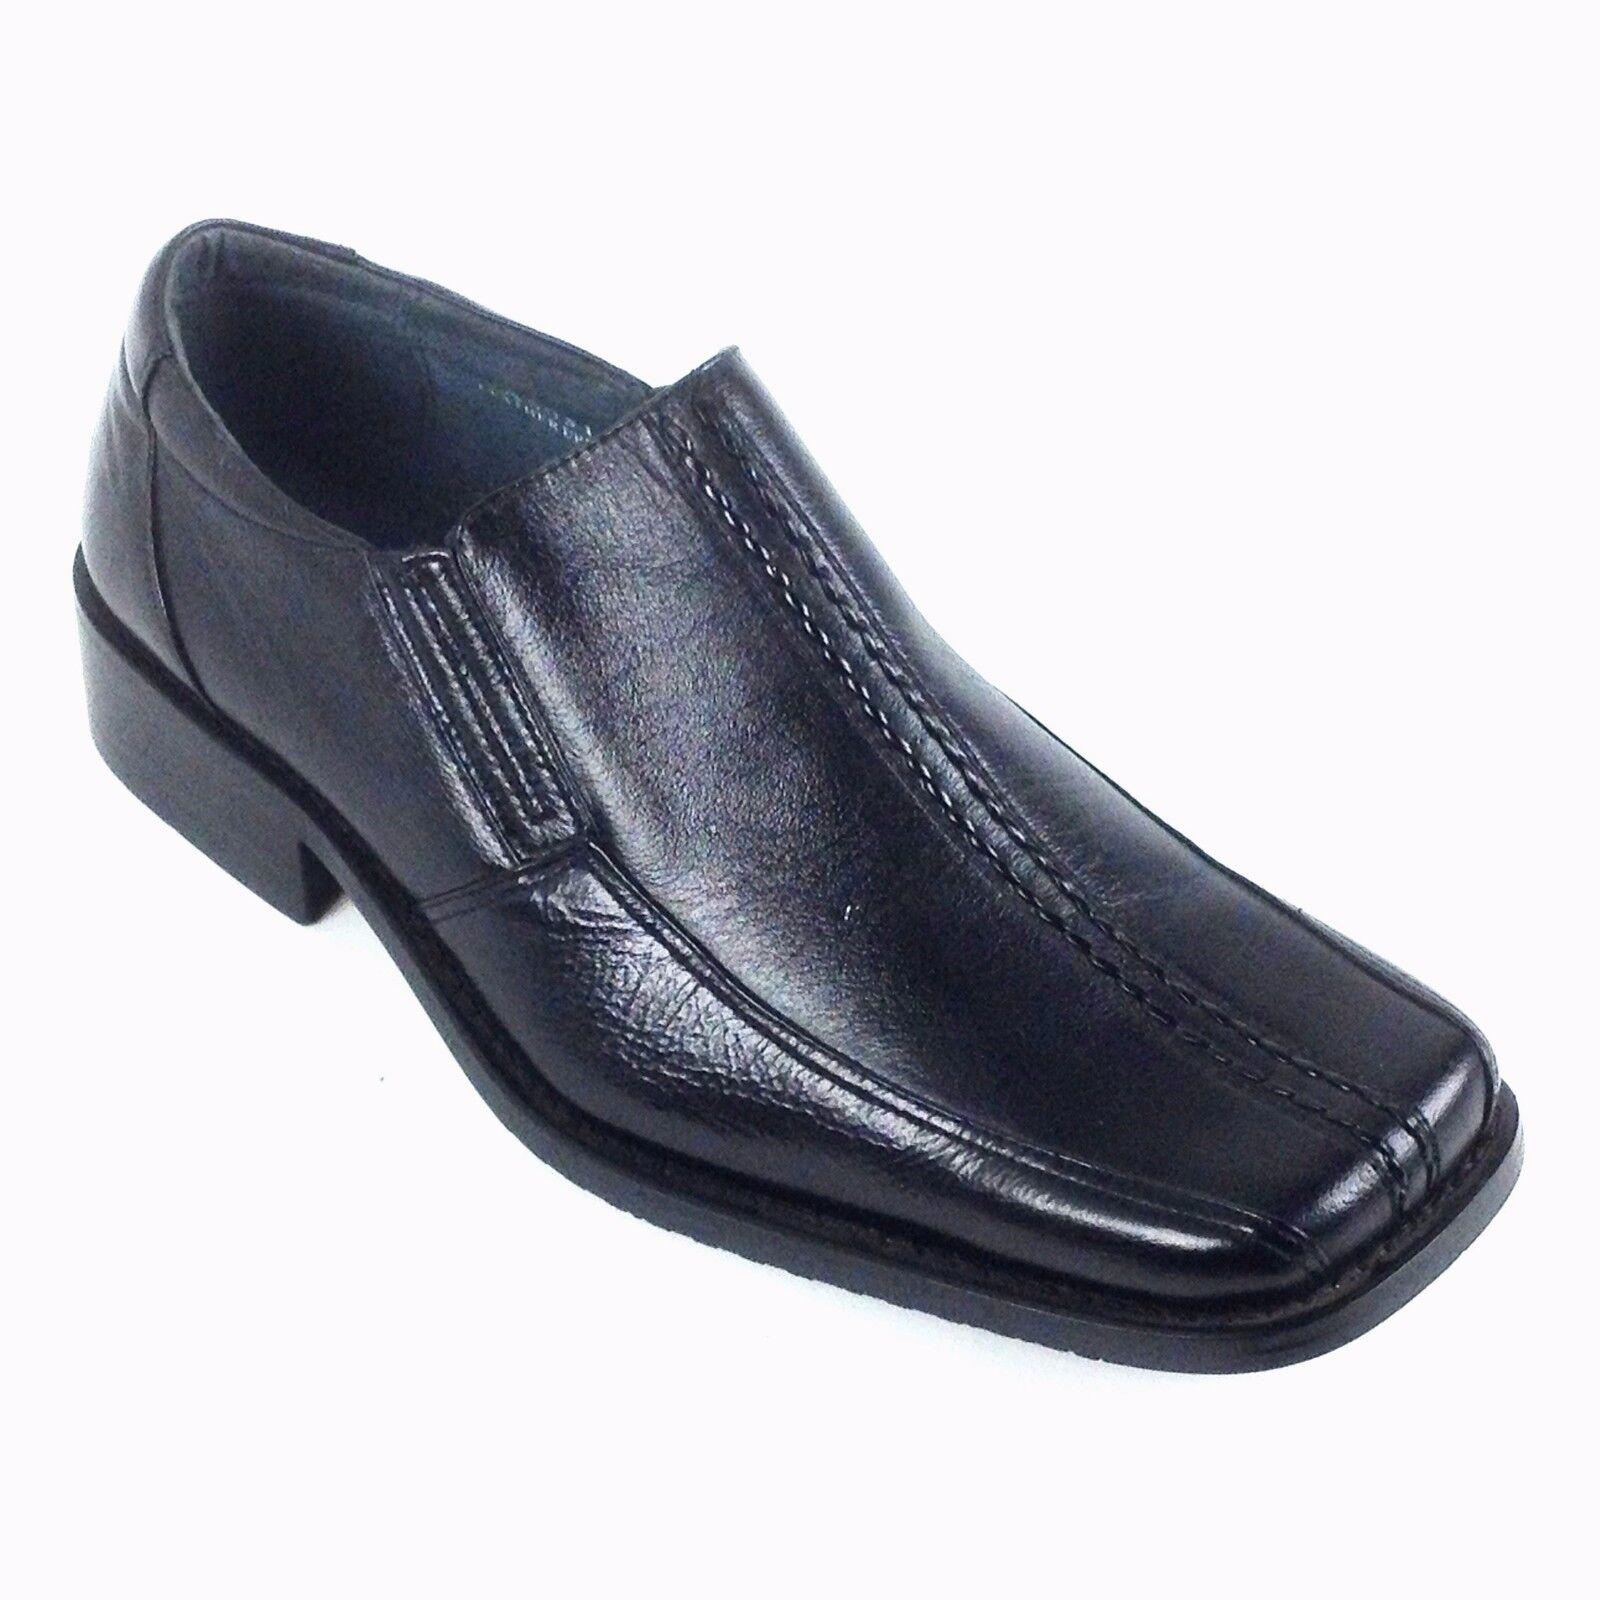 Climate Black Men's Leather Slip Dress shoes Style   A5031 Size  7.5,8.